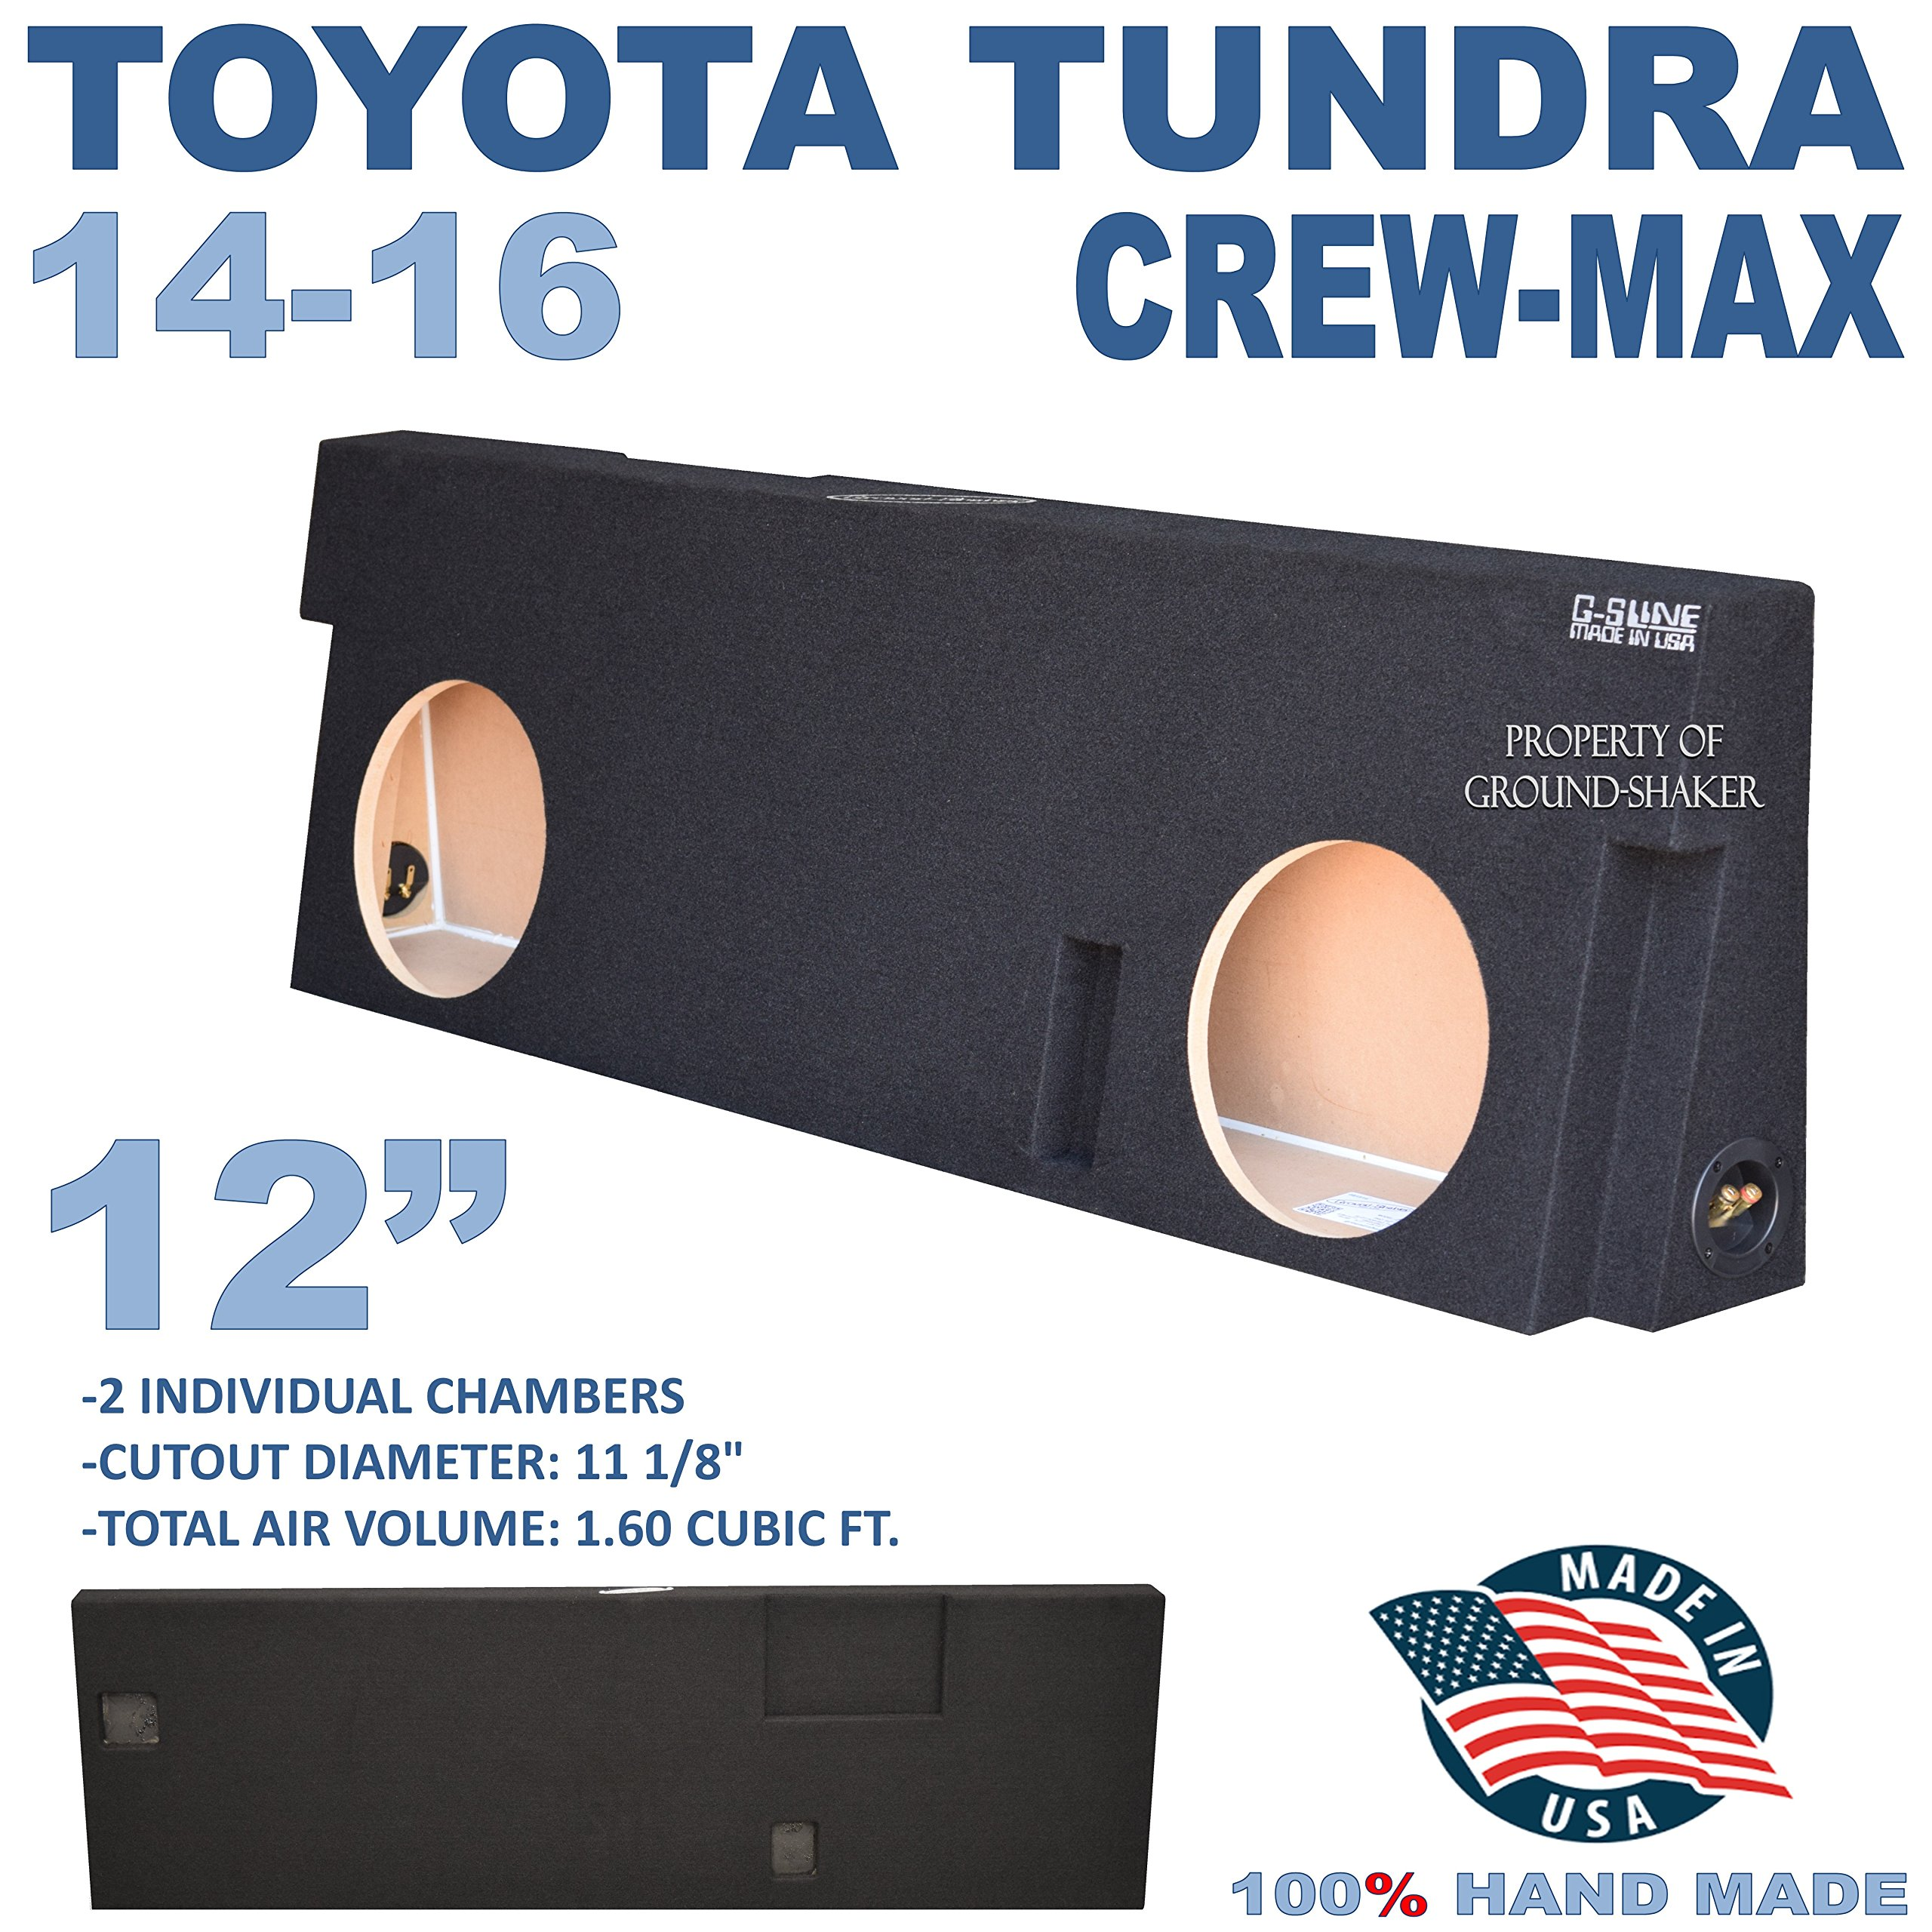 14-16 TOYOTA TUNDRA CREWMAX 12'' DUAL SUBWOOFER SUB ENCLOSURE BOX GROUND-SHAKER